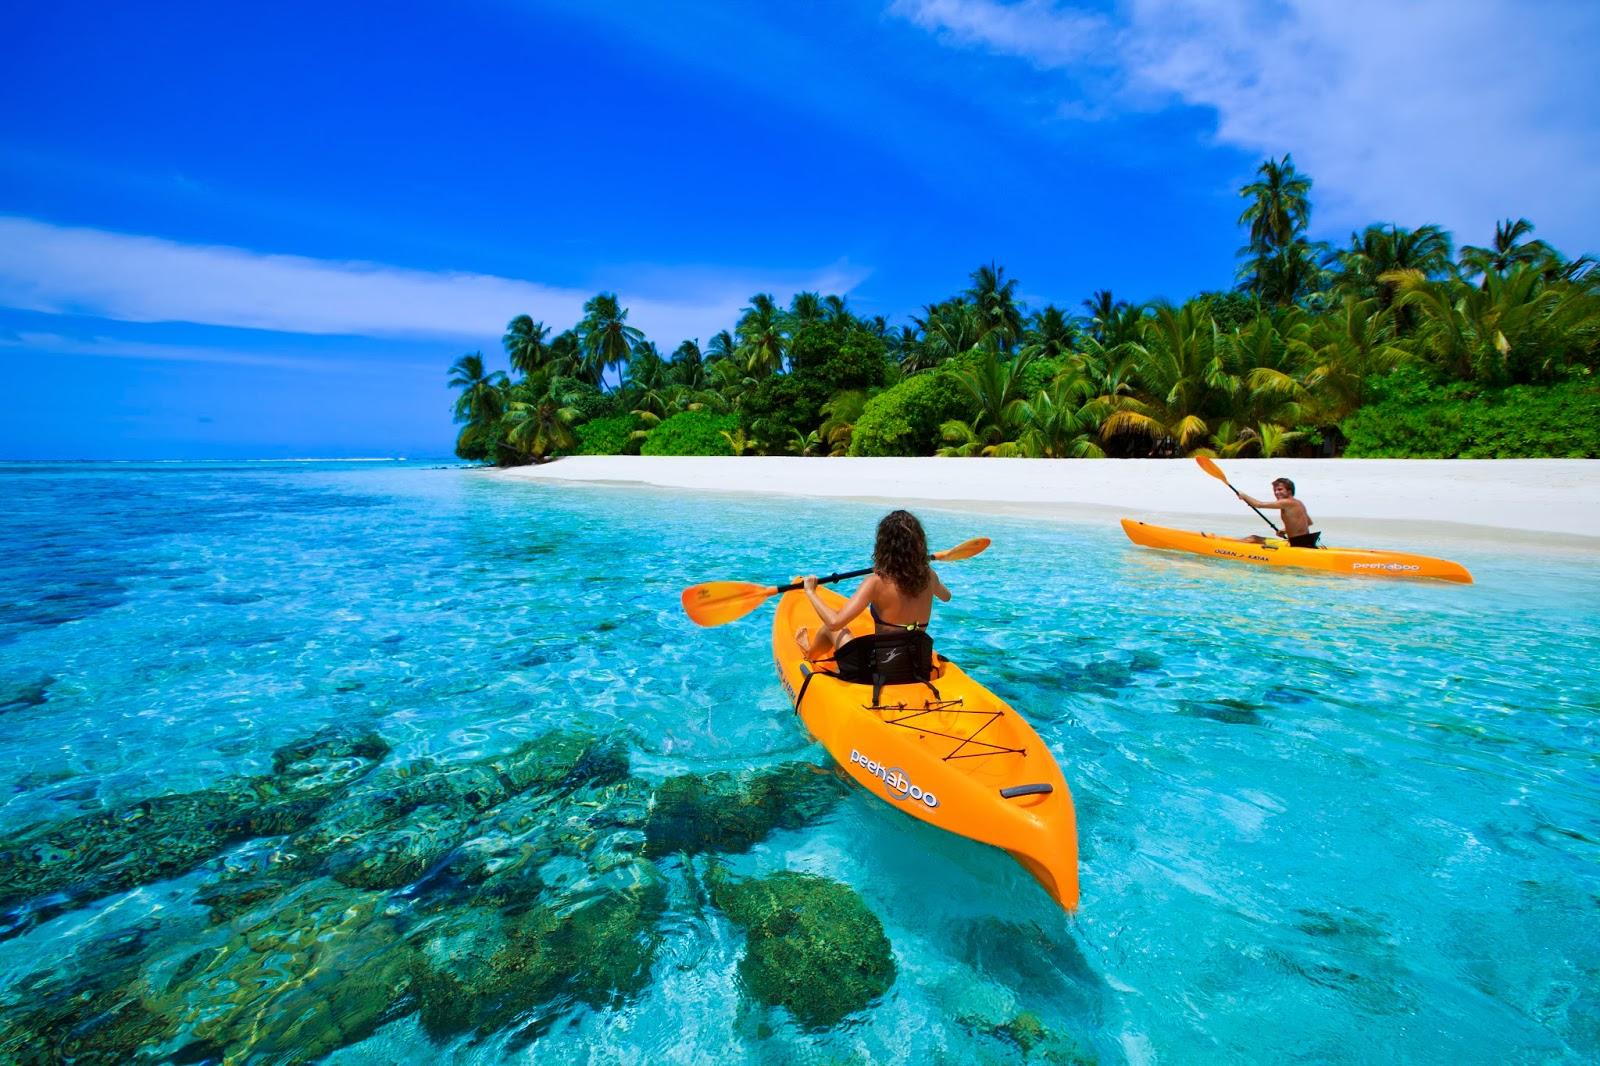 Sun-Dolphin-Bali-SS-12-Foot-Sit-on-top-Kayak-1024x683 Bali Kayak